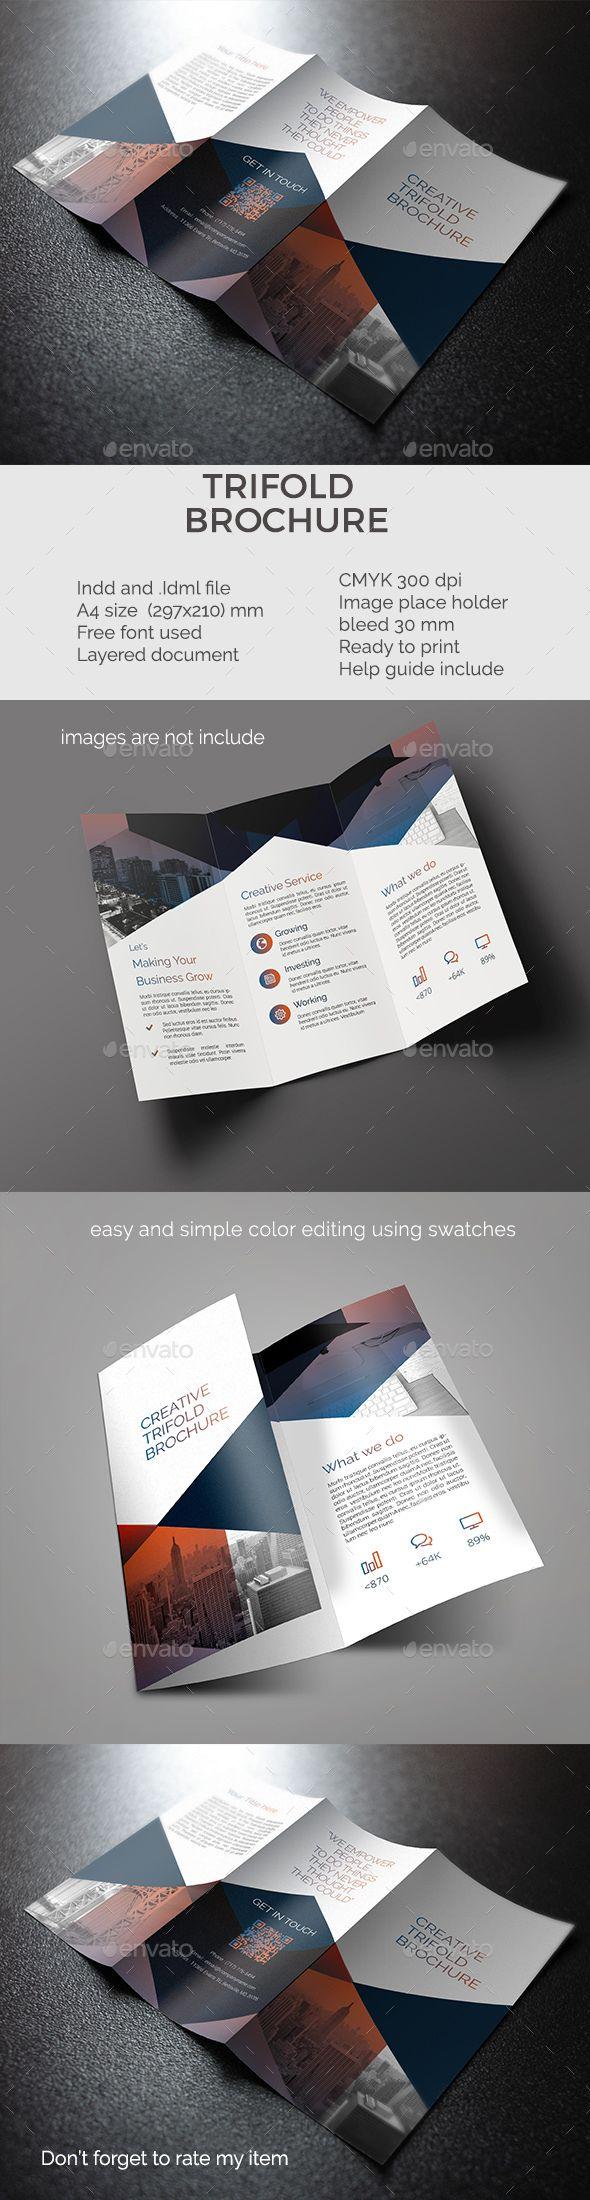 best 85 bi fold brochure images on pinterest brochure template